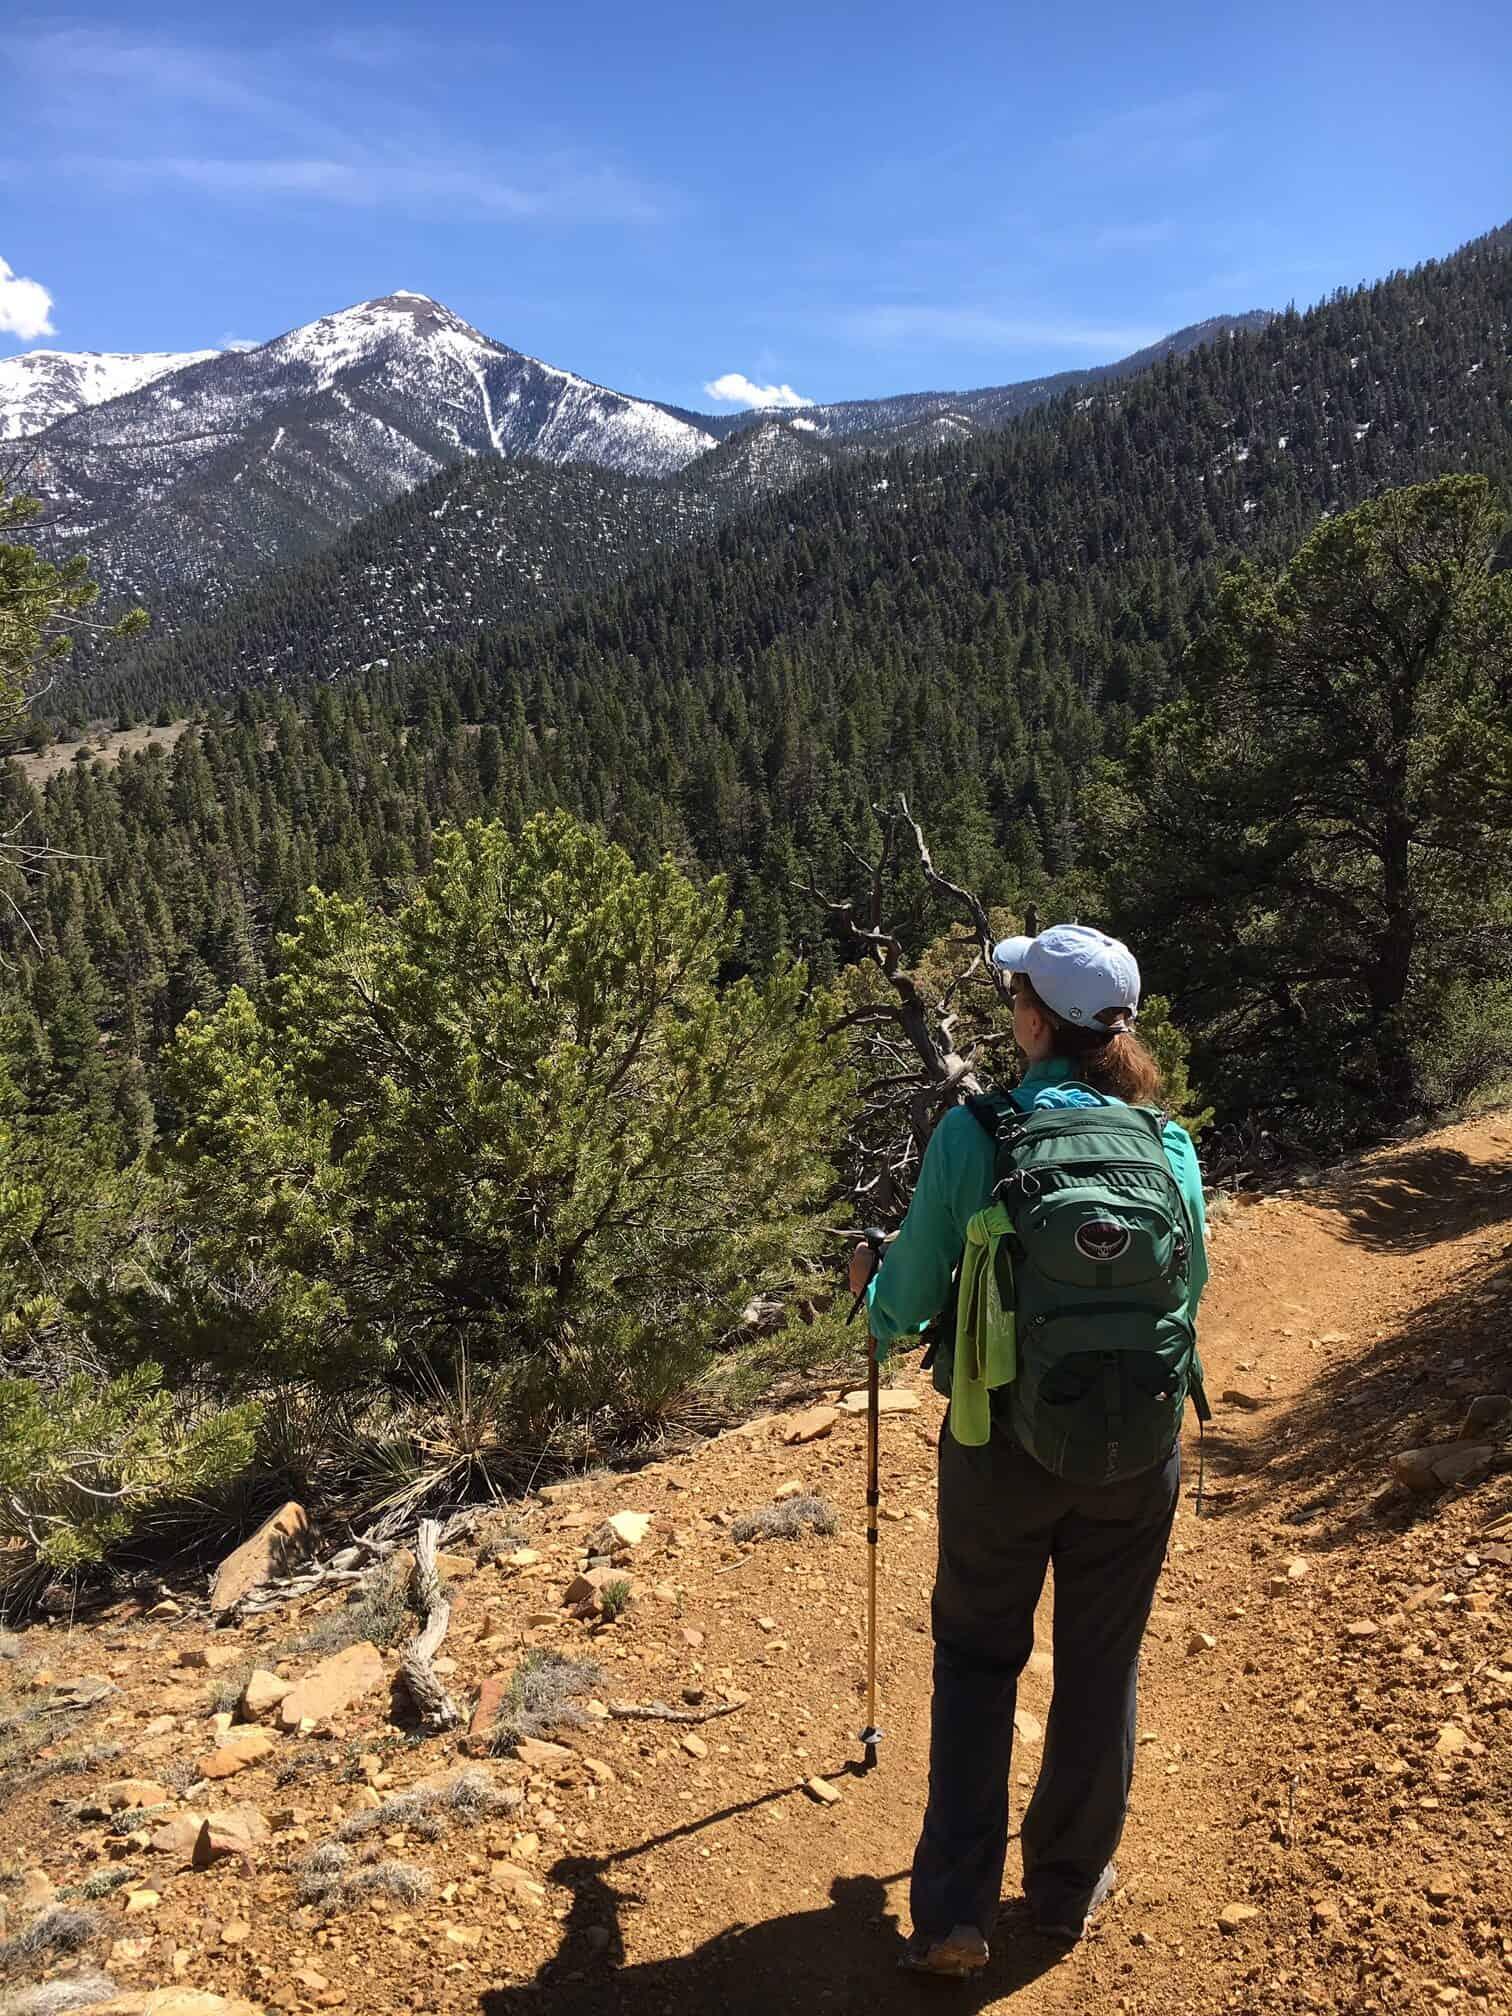 Hiking after injury